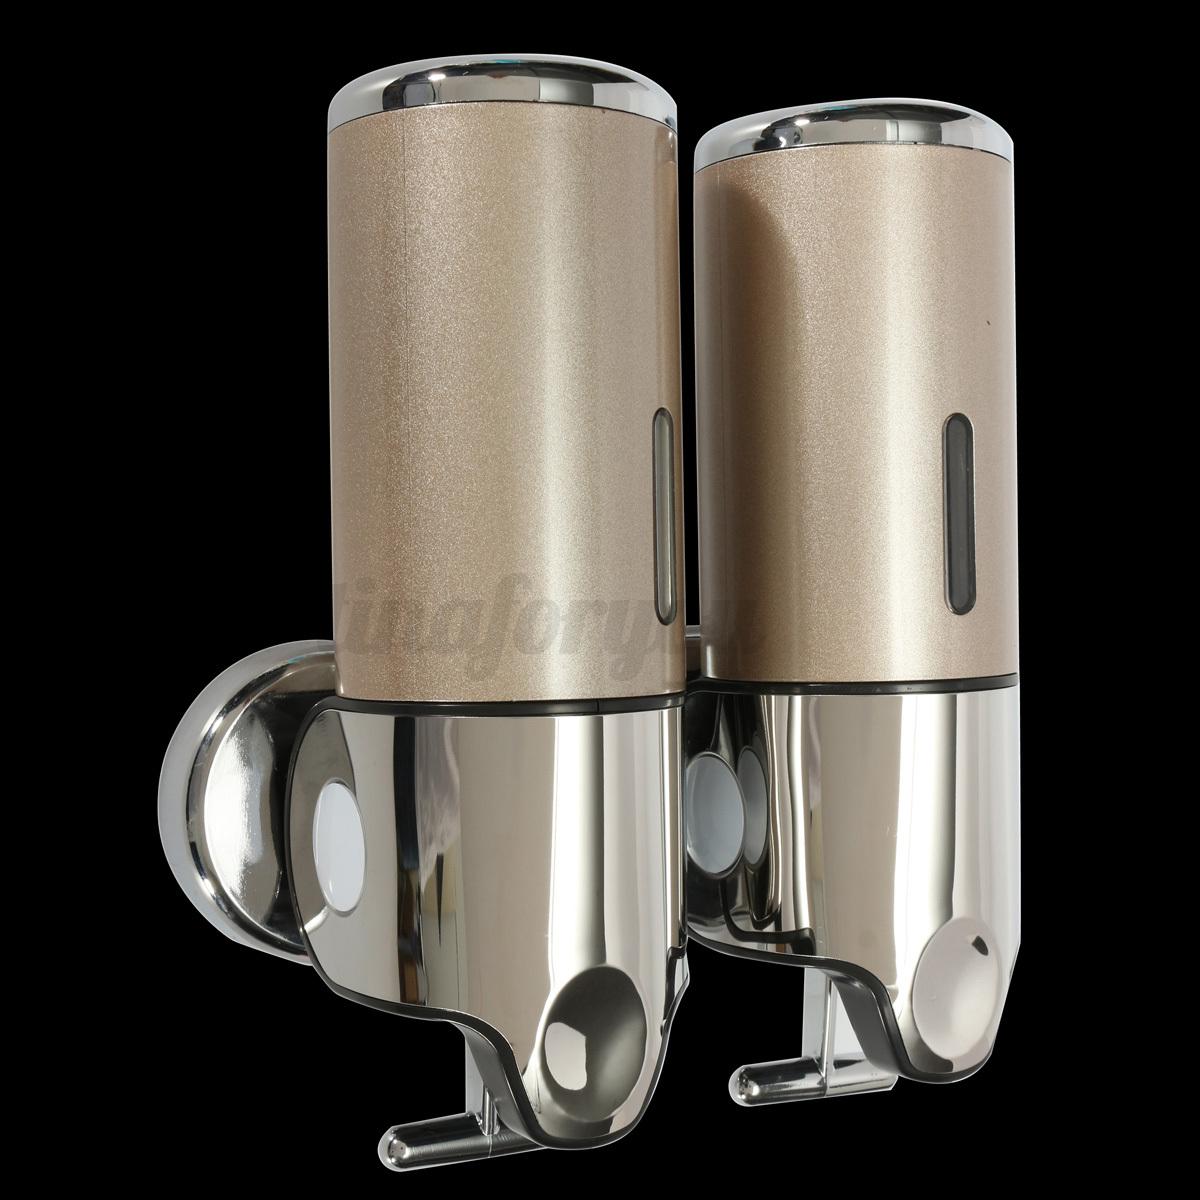 3 Bottles Wall Mounted Hotel Bathroom Soap Dispenser 500ML Liquid Shampoo Shower  eBay